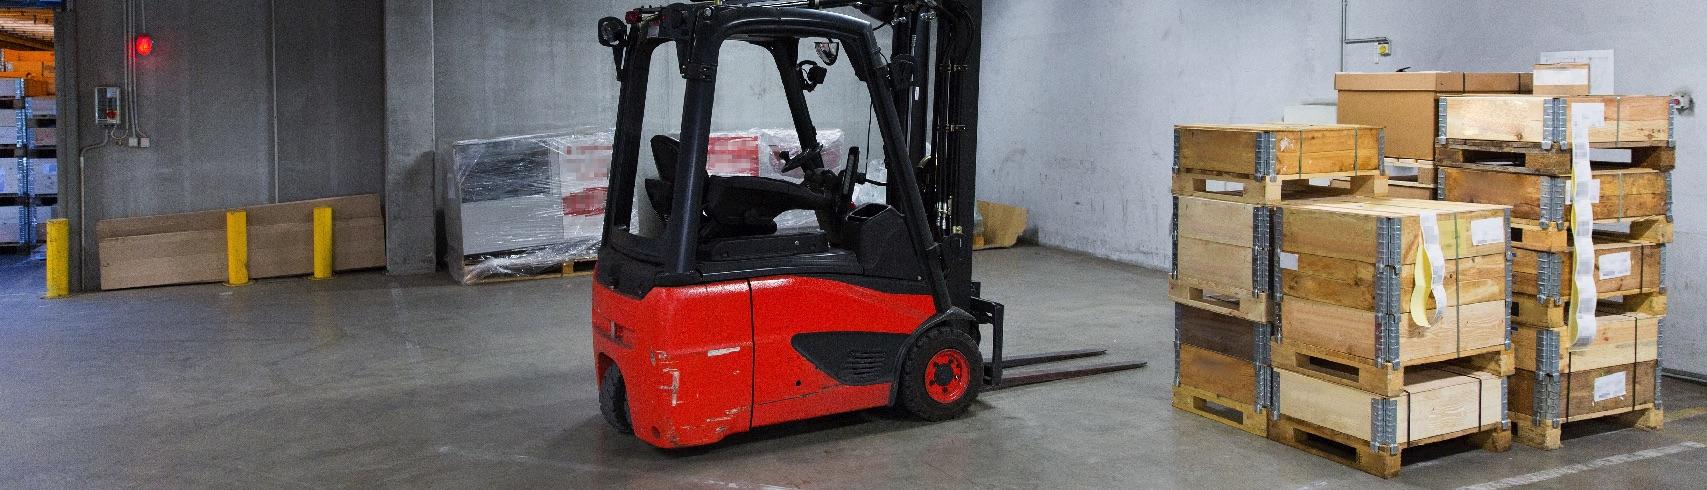 Forklift & Material Handling Rental | Los Angeles